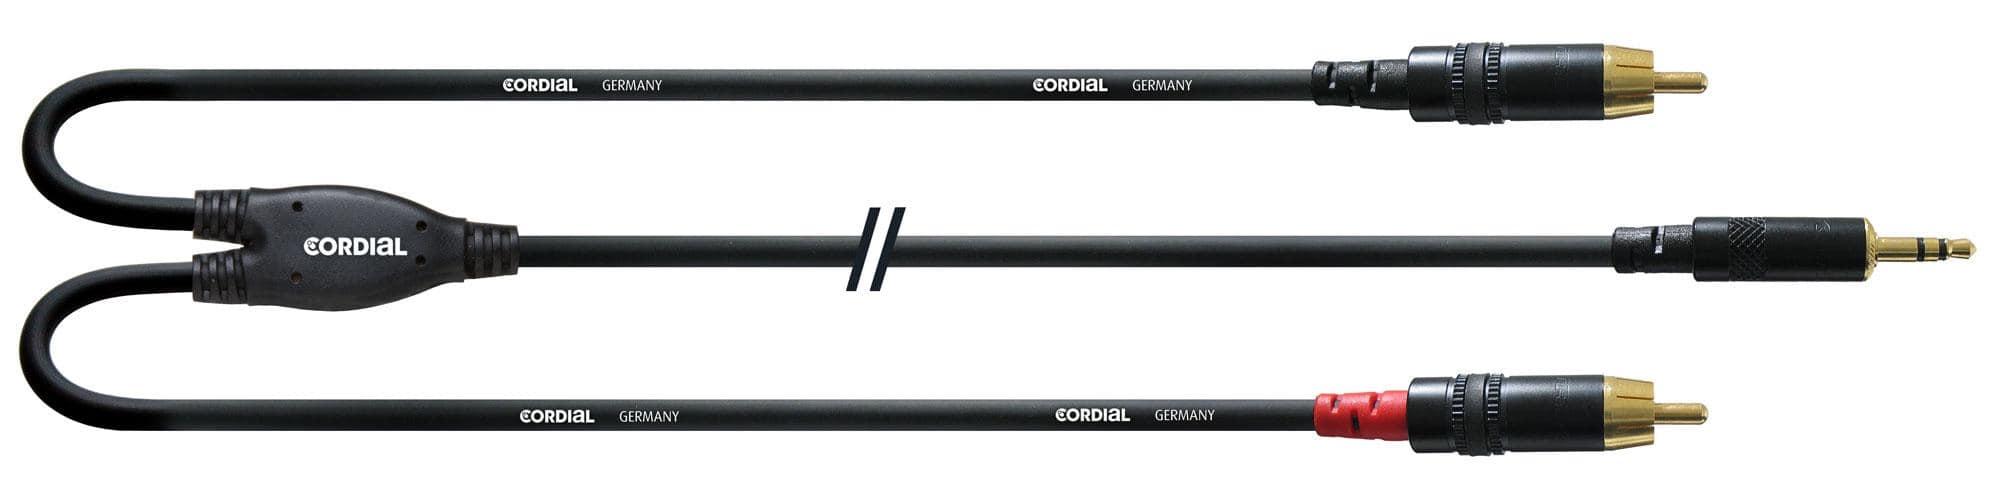 Cordial CFY 3 WCC 3,5 mm Klinke stereo 2 x Cinch 1,5 m